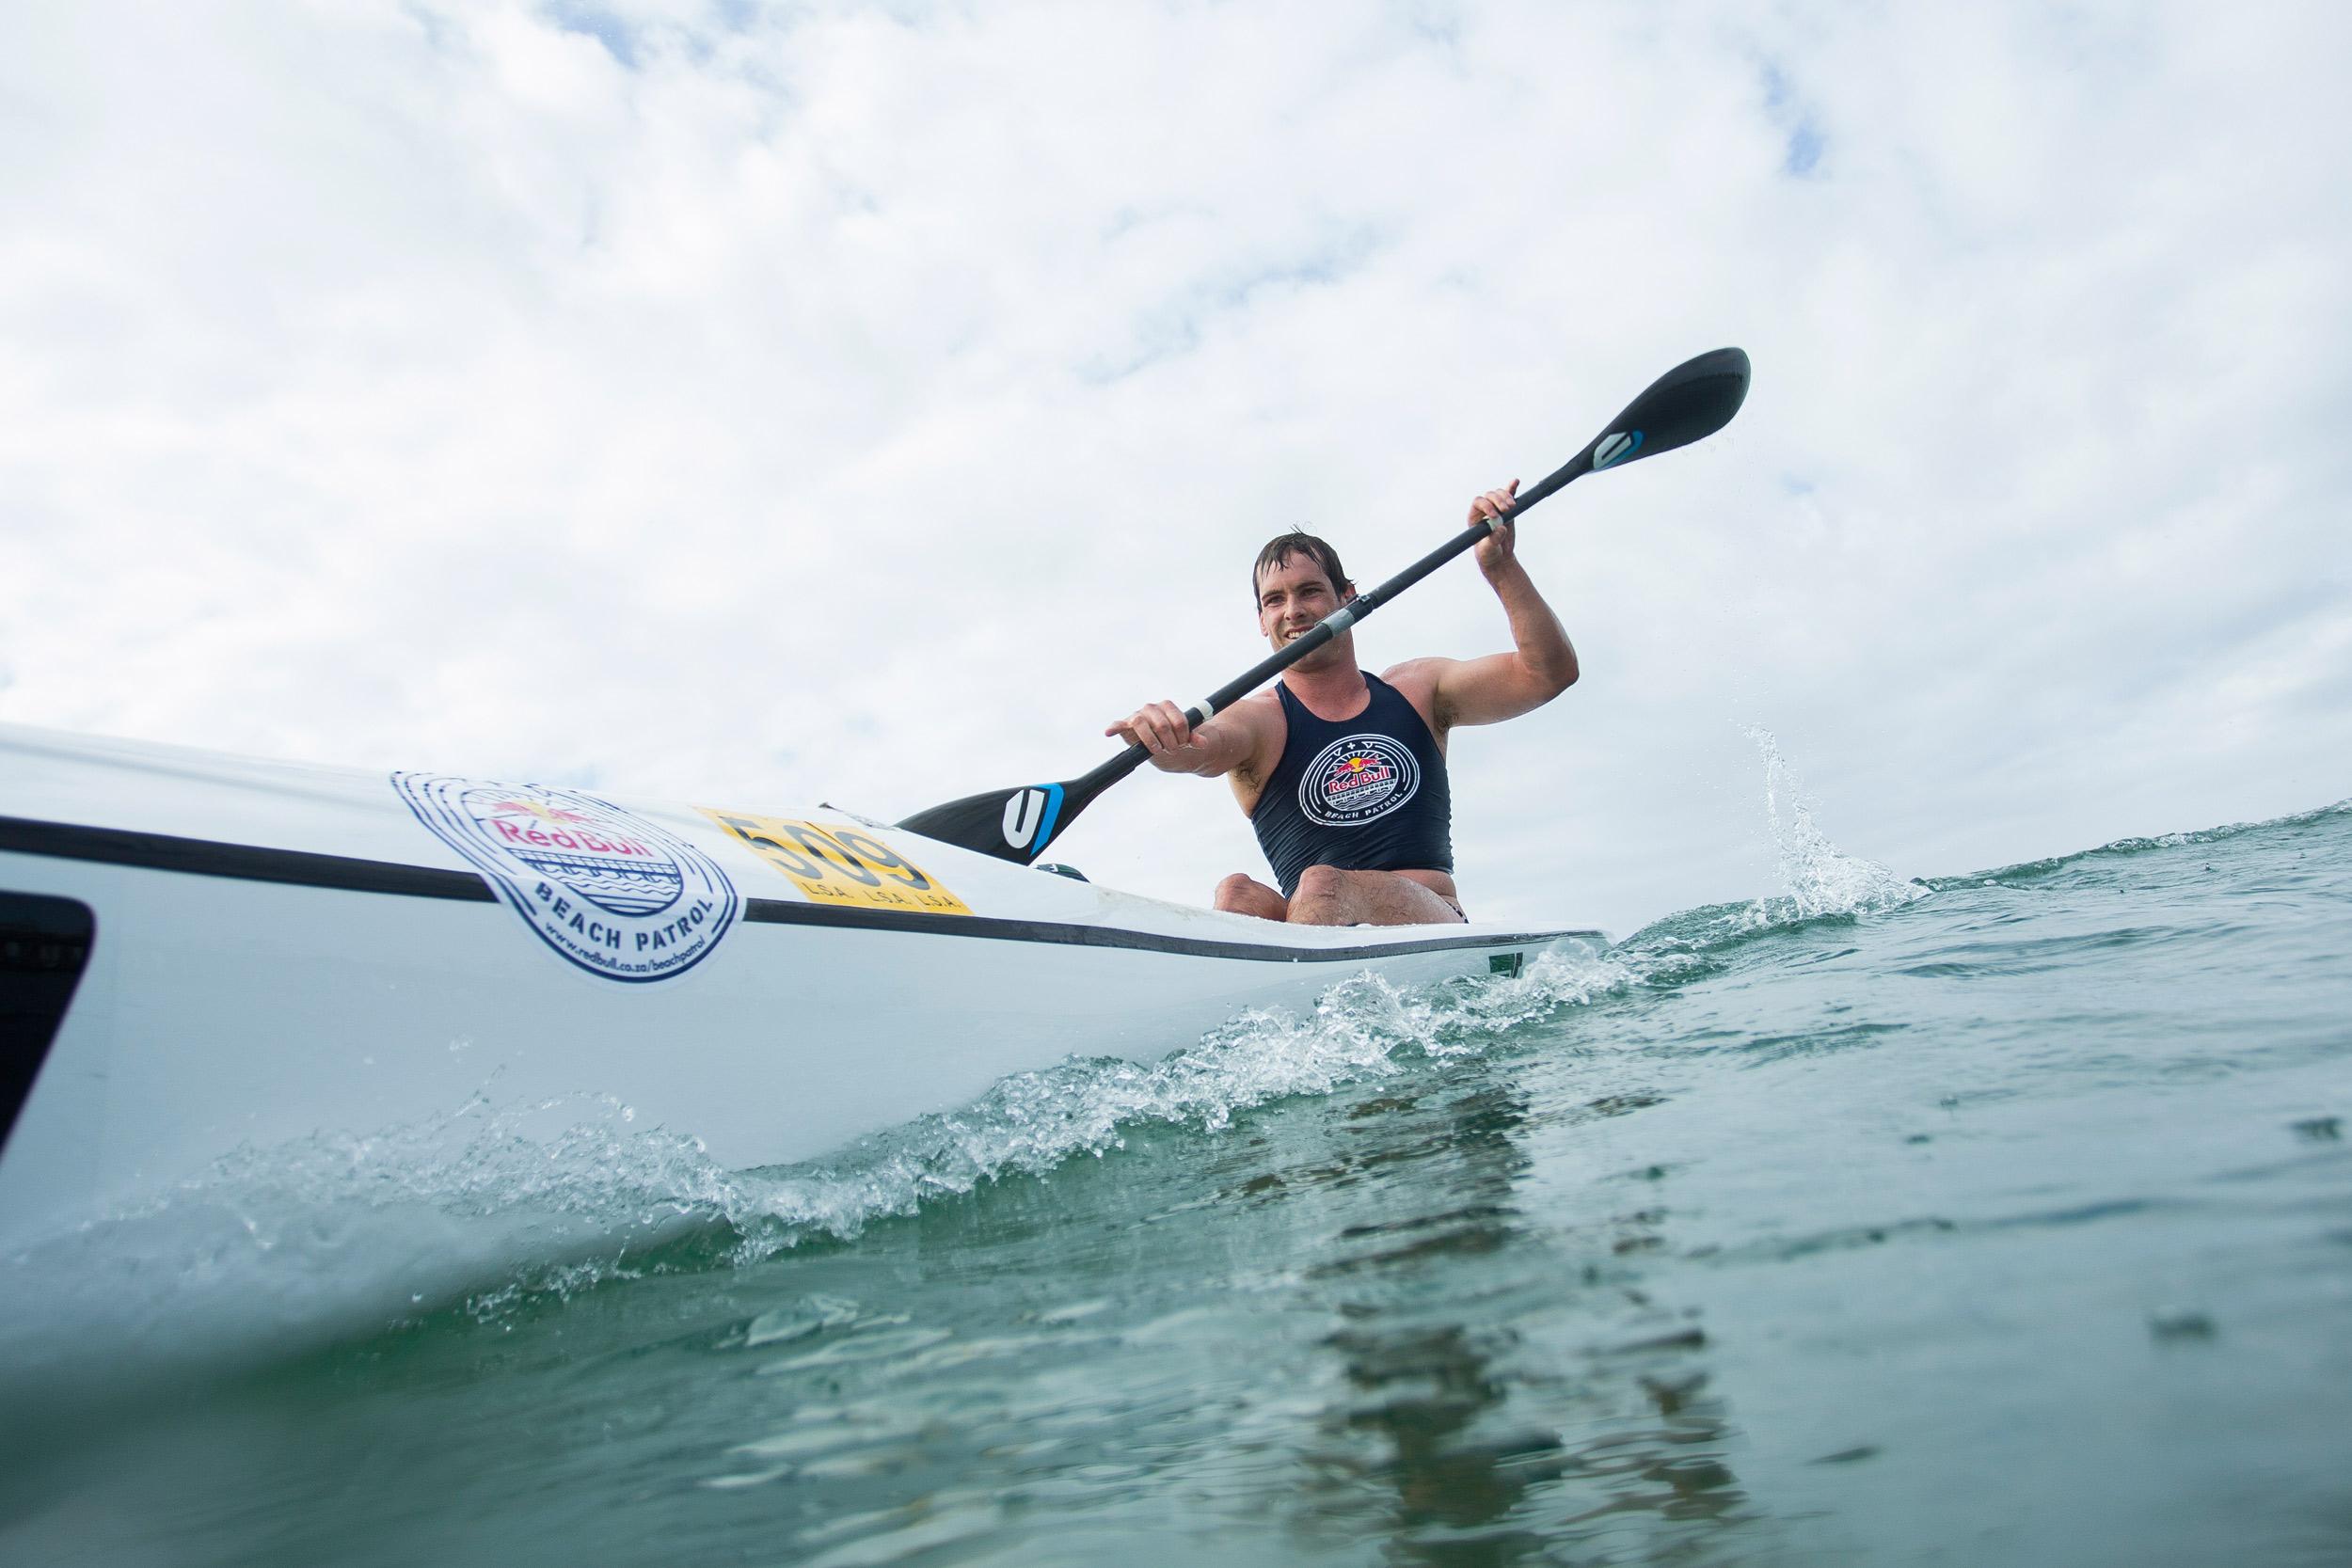 Nisbet nails top lifesaving title in Durban